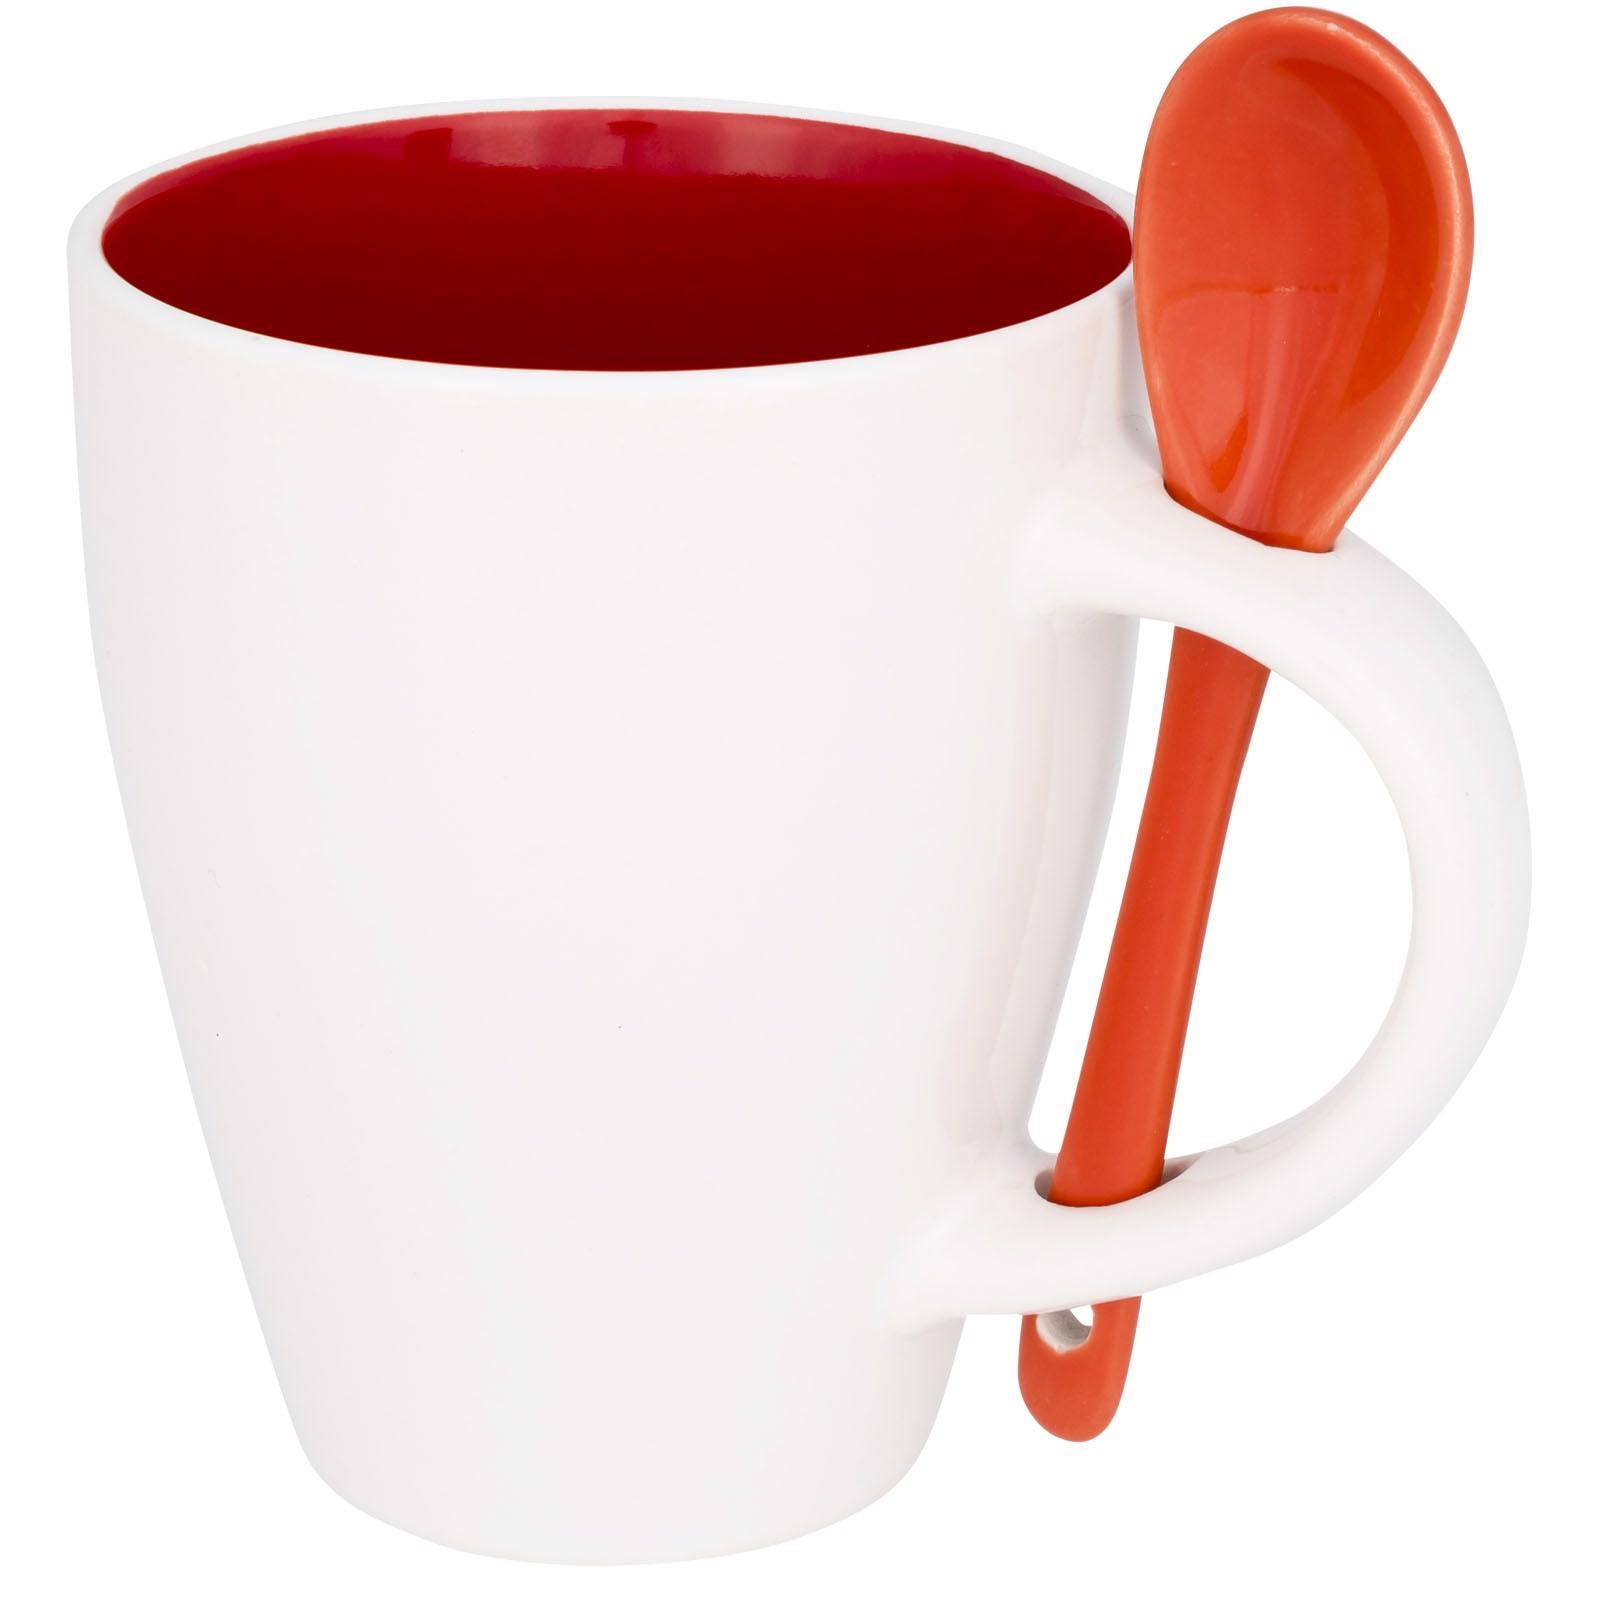 Nadu 250 ml Tasse mit Löffel - Rot